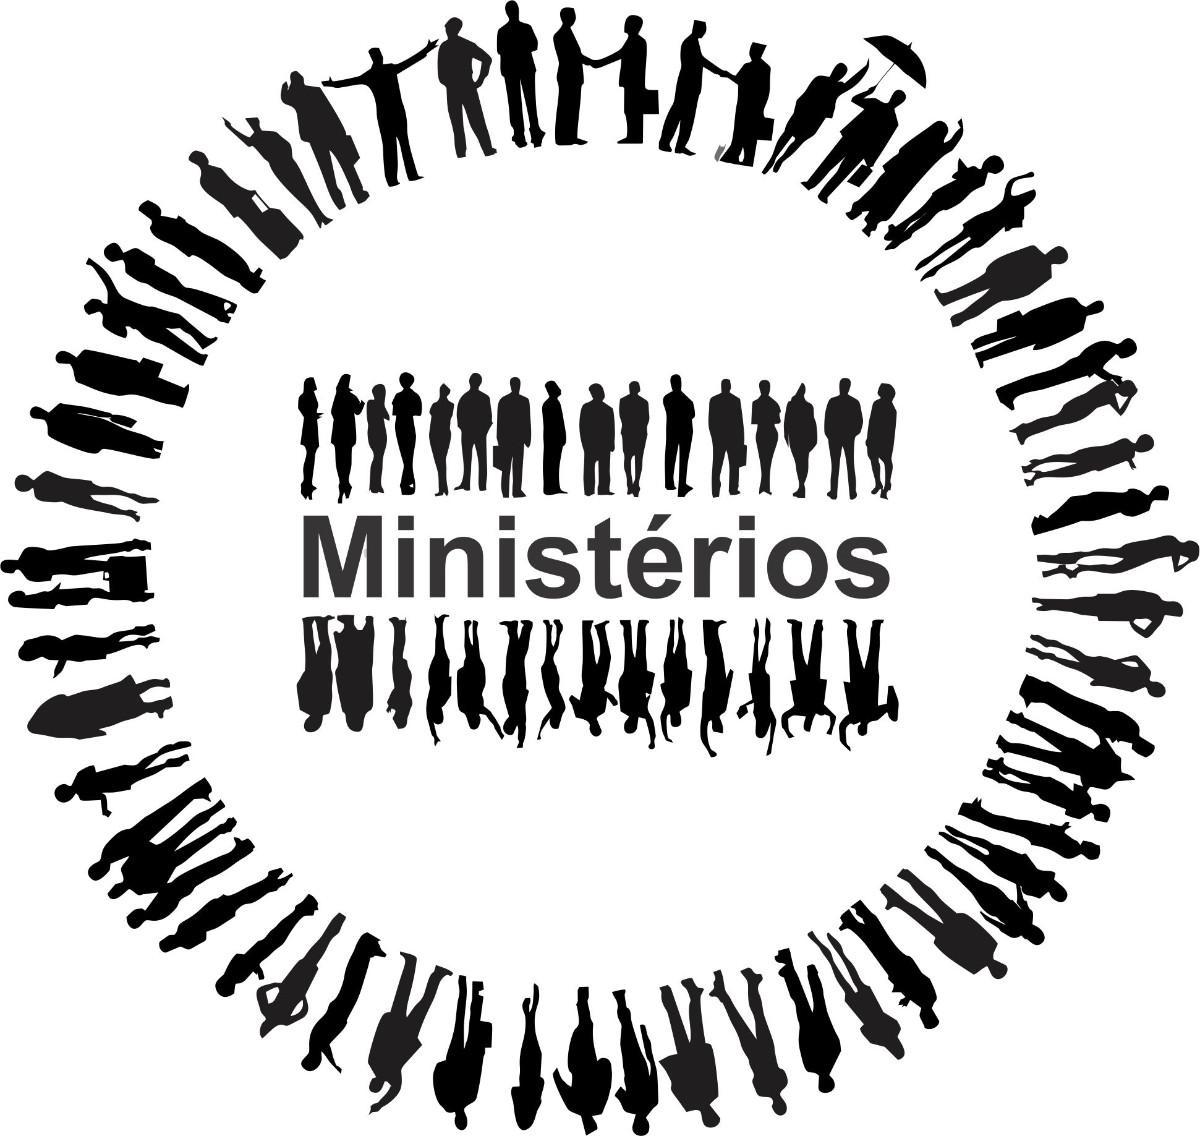 Ministerios da Igreja